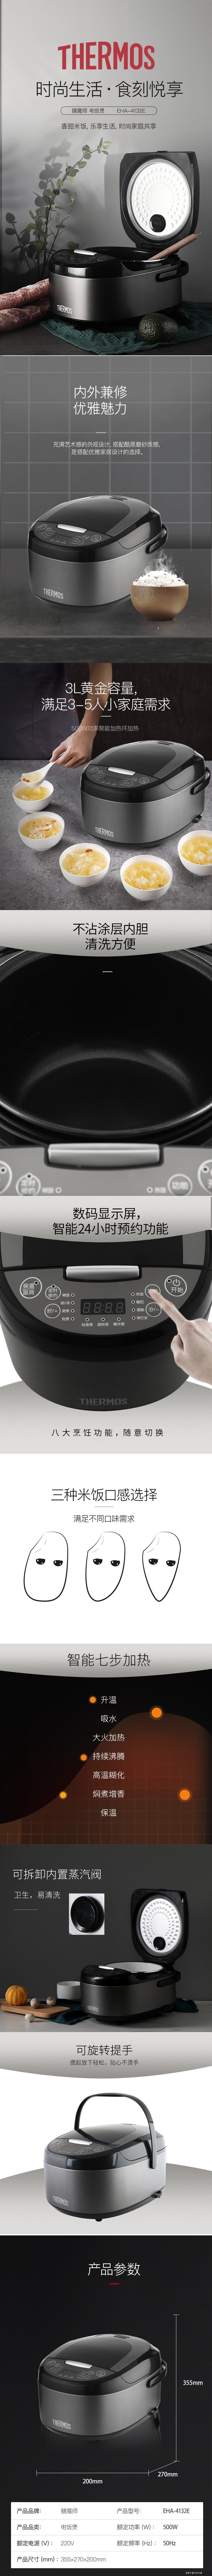 18.12 EHA-4132E膳魔师 电饭煲(审核OK).jpg